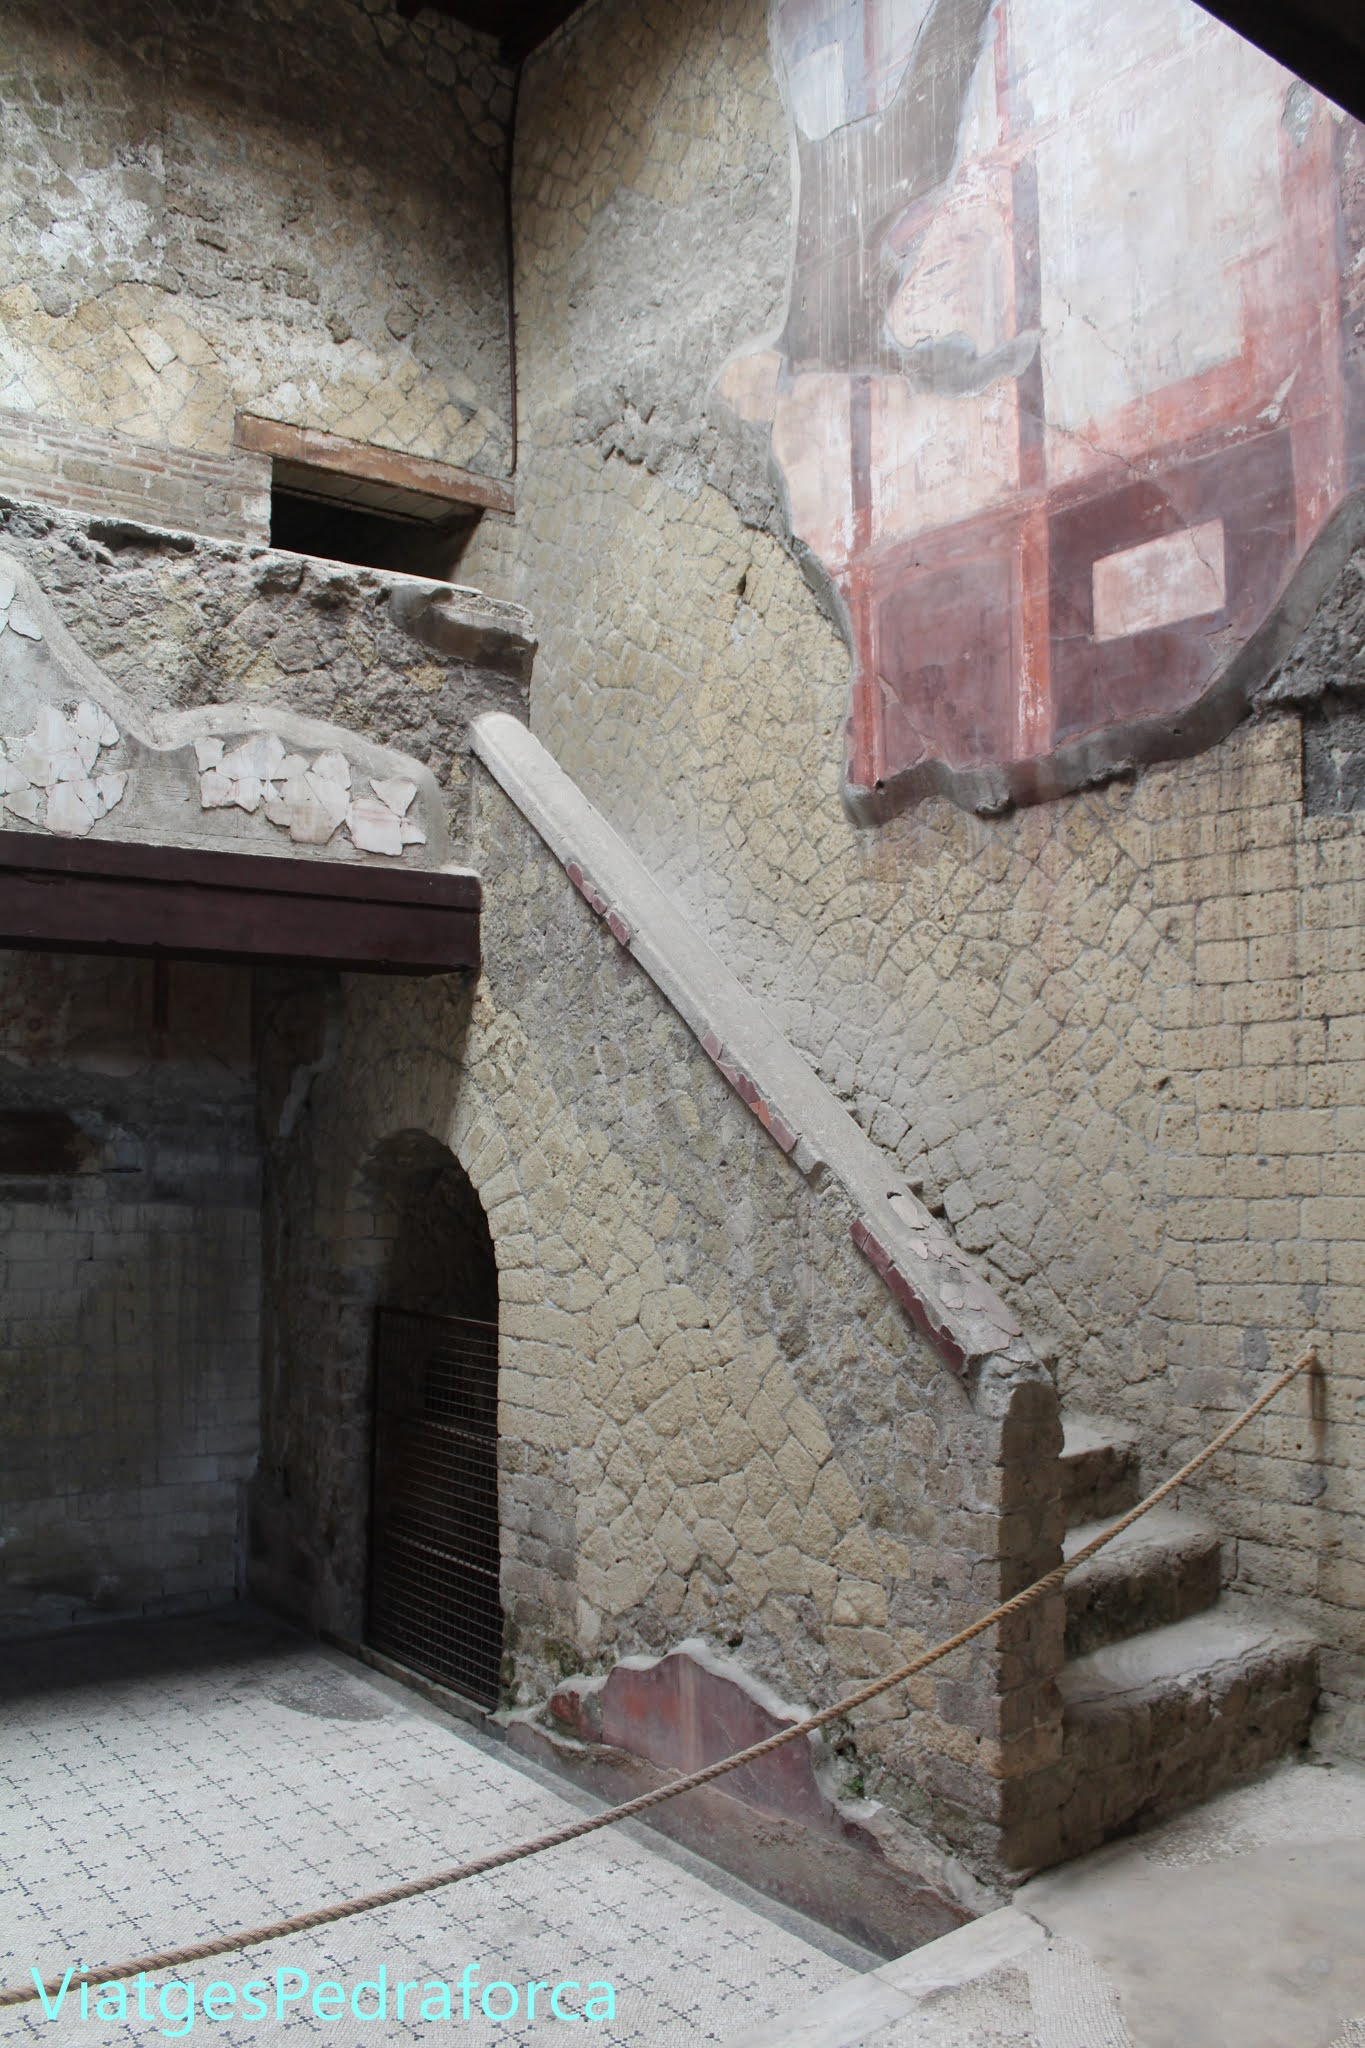 Arqueologia, Campània, Itàlia, Patrimoni de la Humanitat, Unesco Heritage